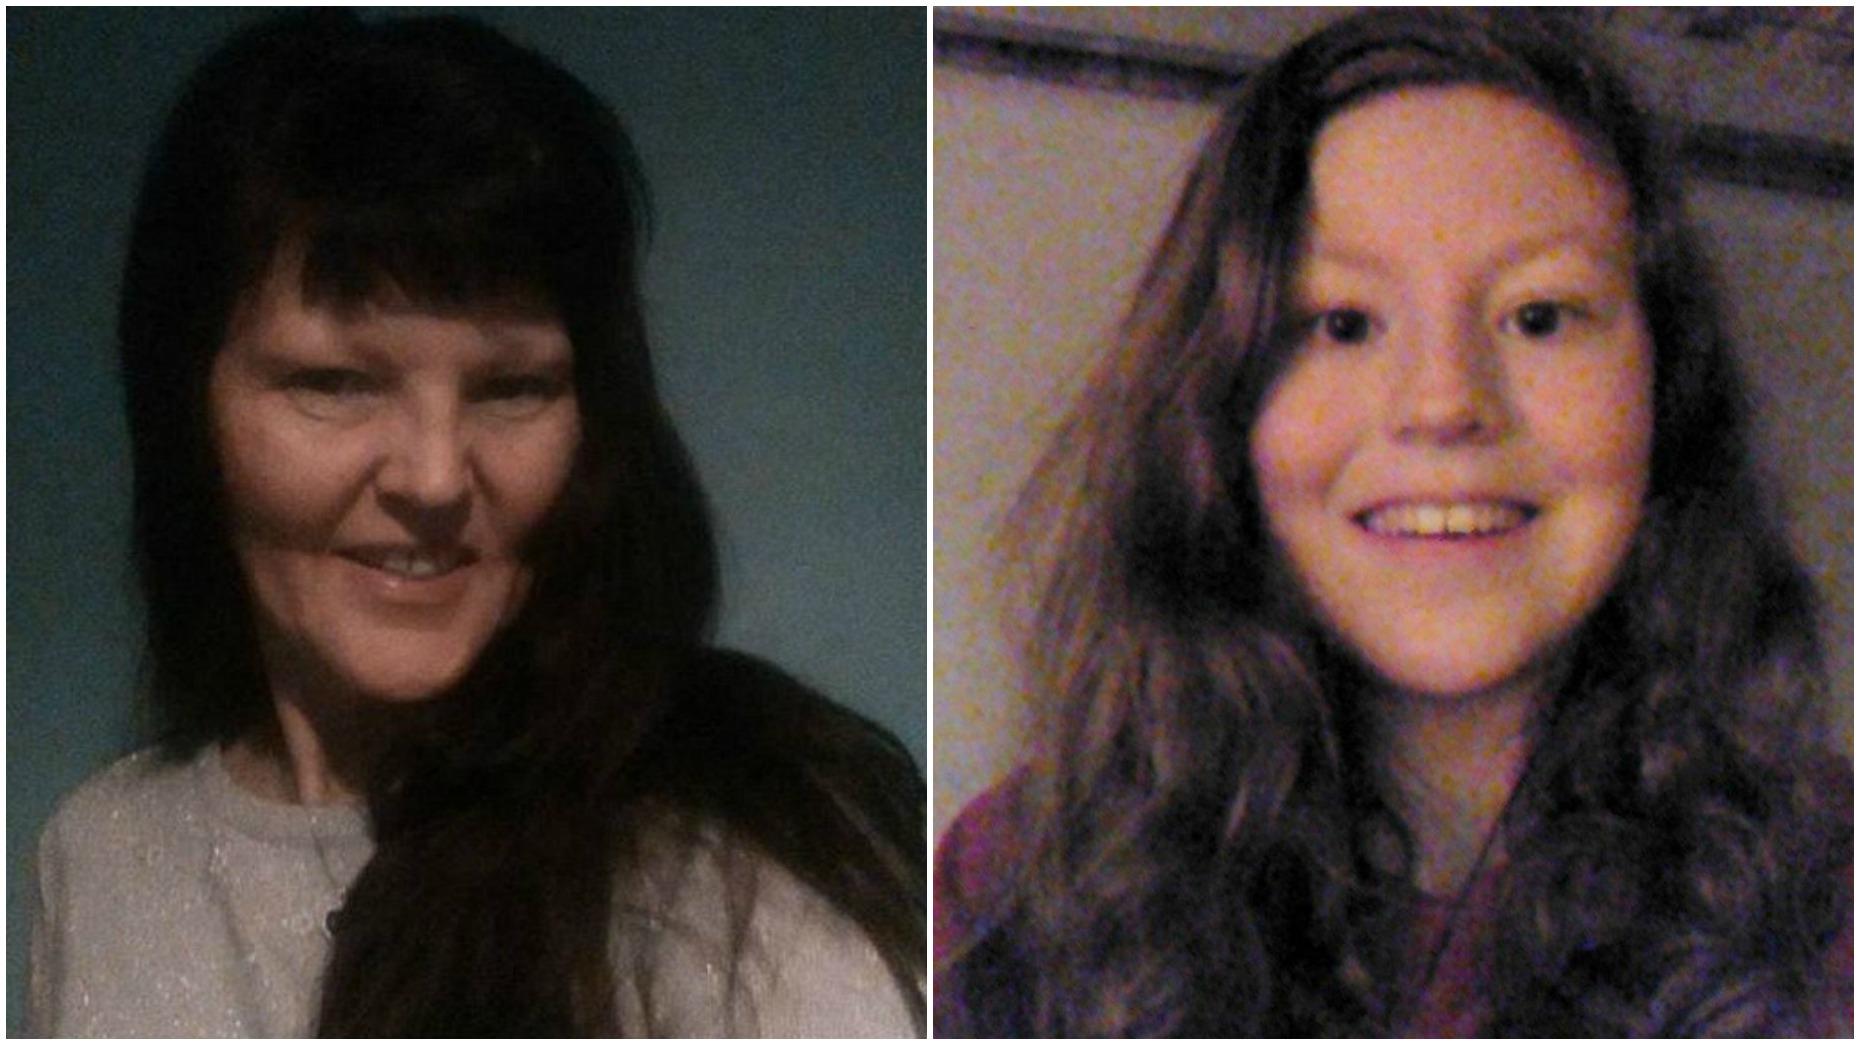 Elizabeth and Katie Edwards were found dead at their home in Spalding